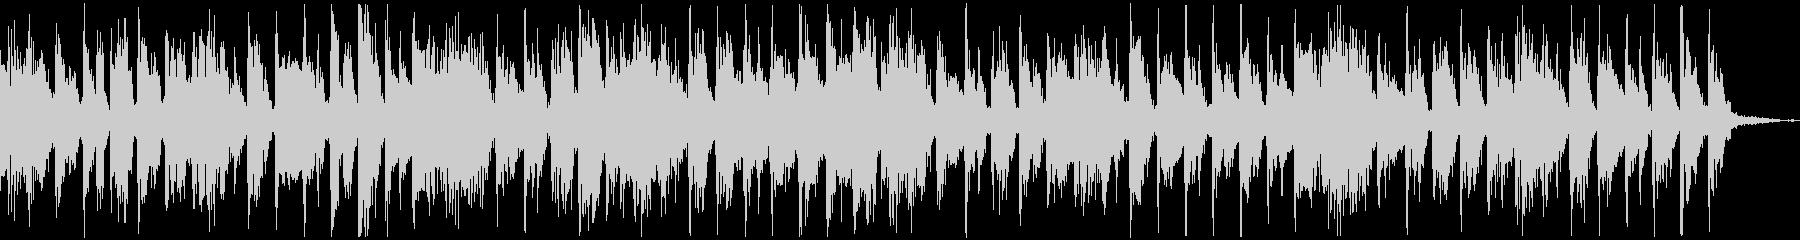 【CM】クールなエレクトロBGM・13の未再生の波形